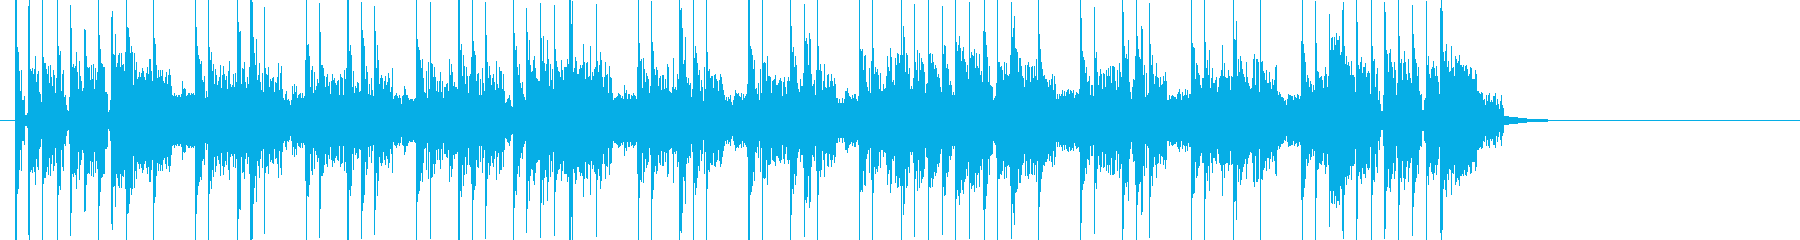 Rock系のジングルの再生済みの波形